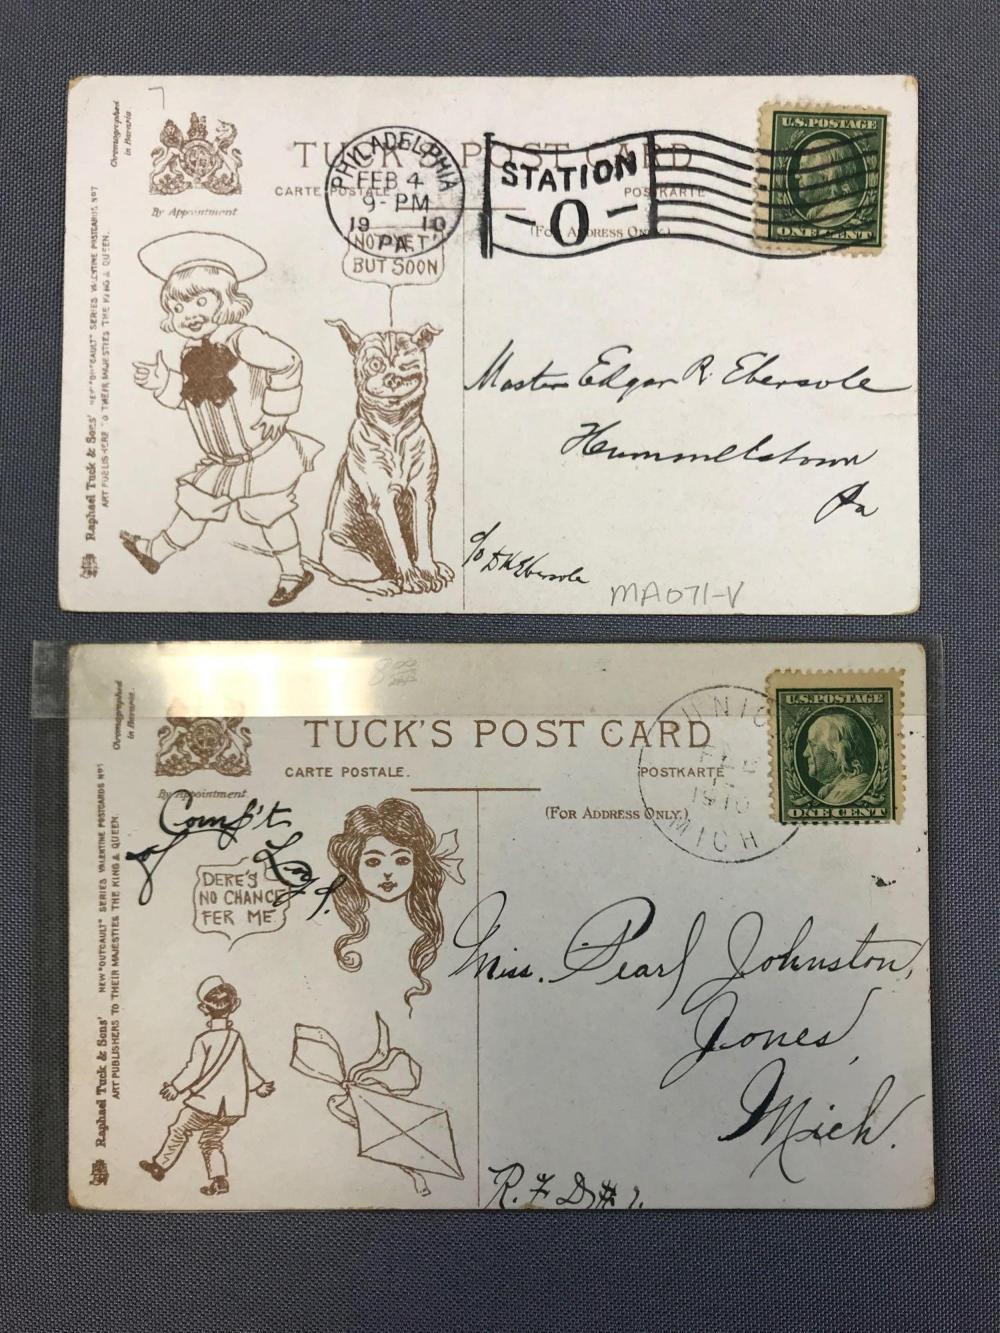 from Rafael dating tucks postcards